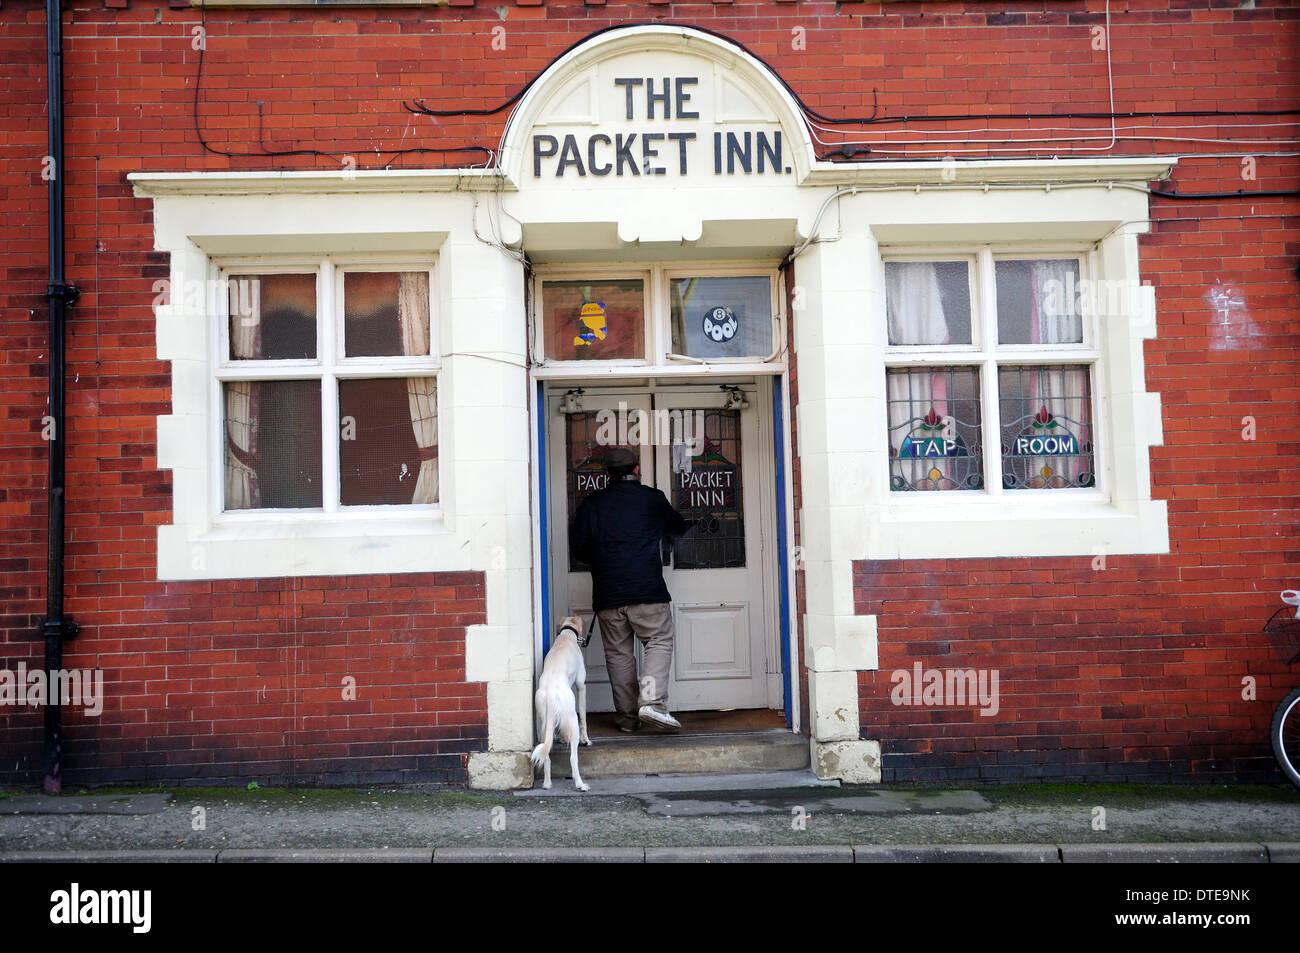 The Packet Inn,Retford Nottinghamshire ,England,UK - Stock Image